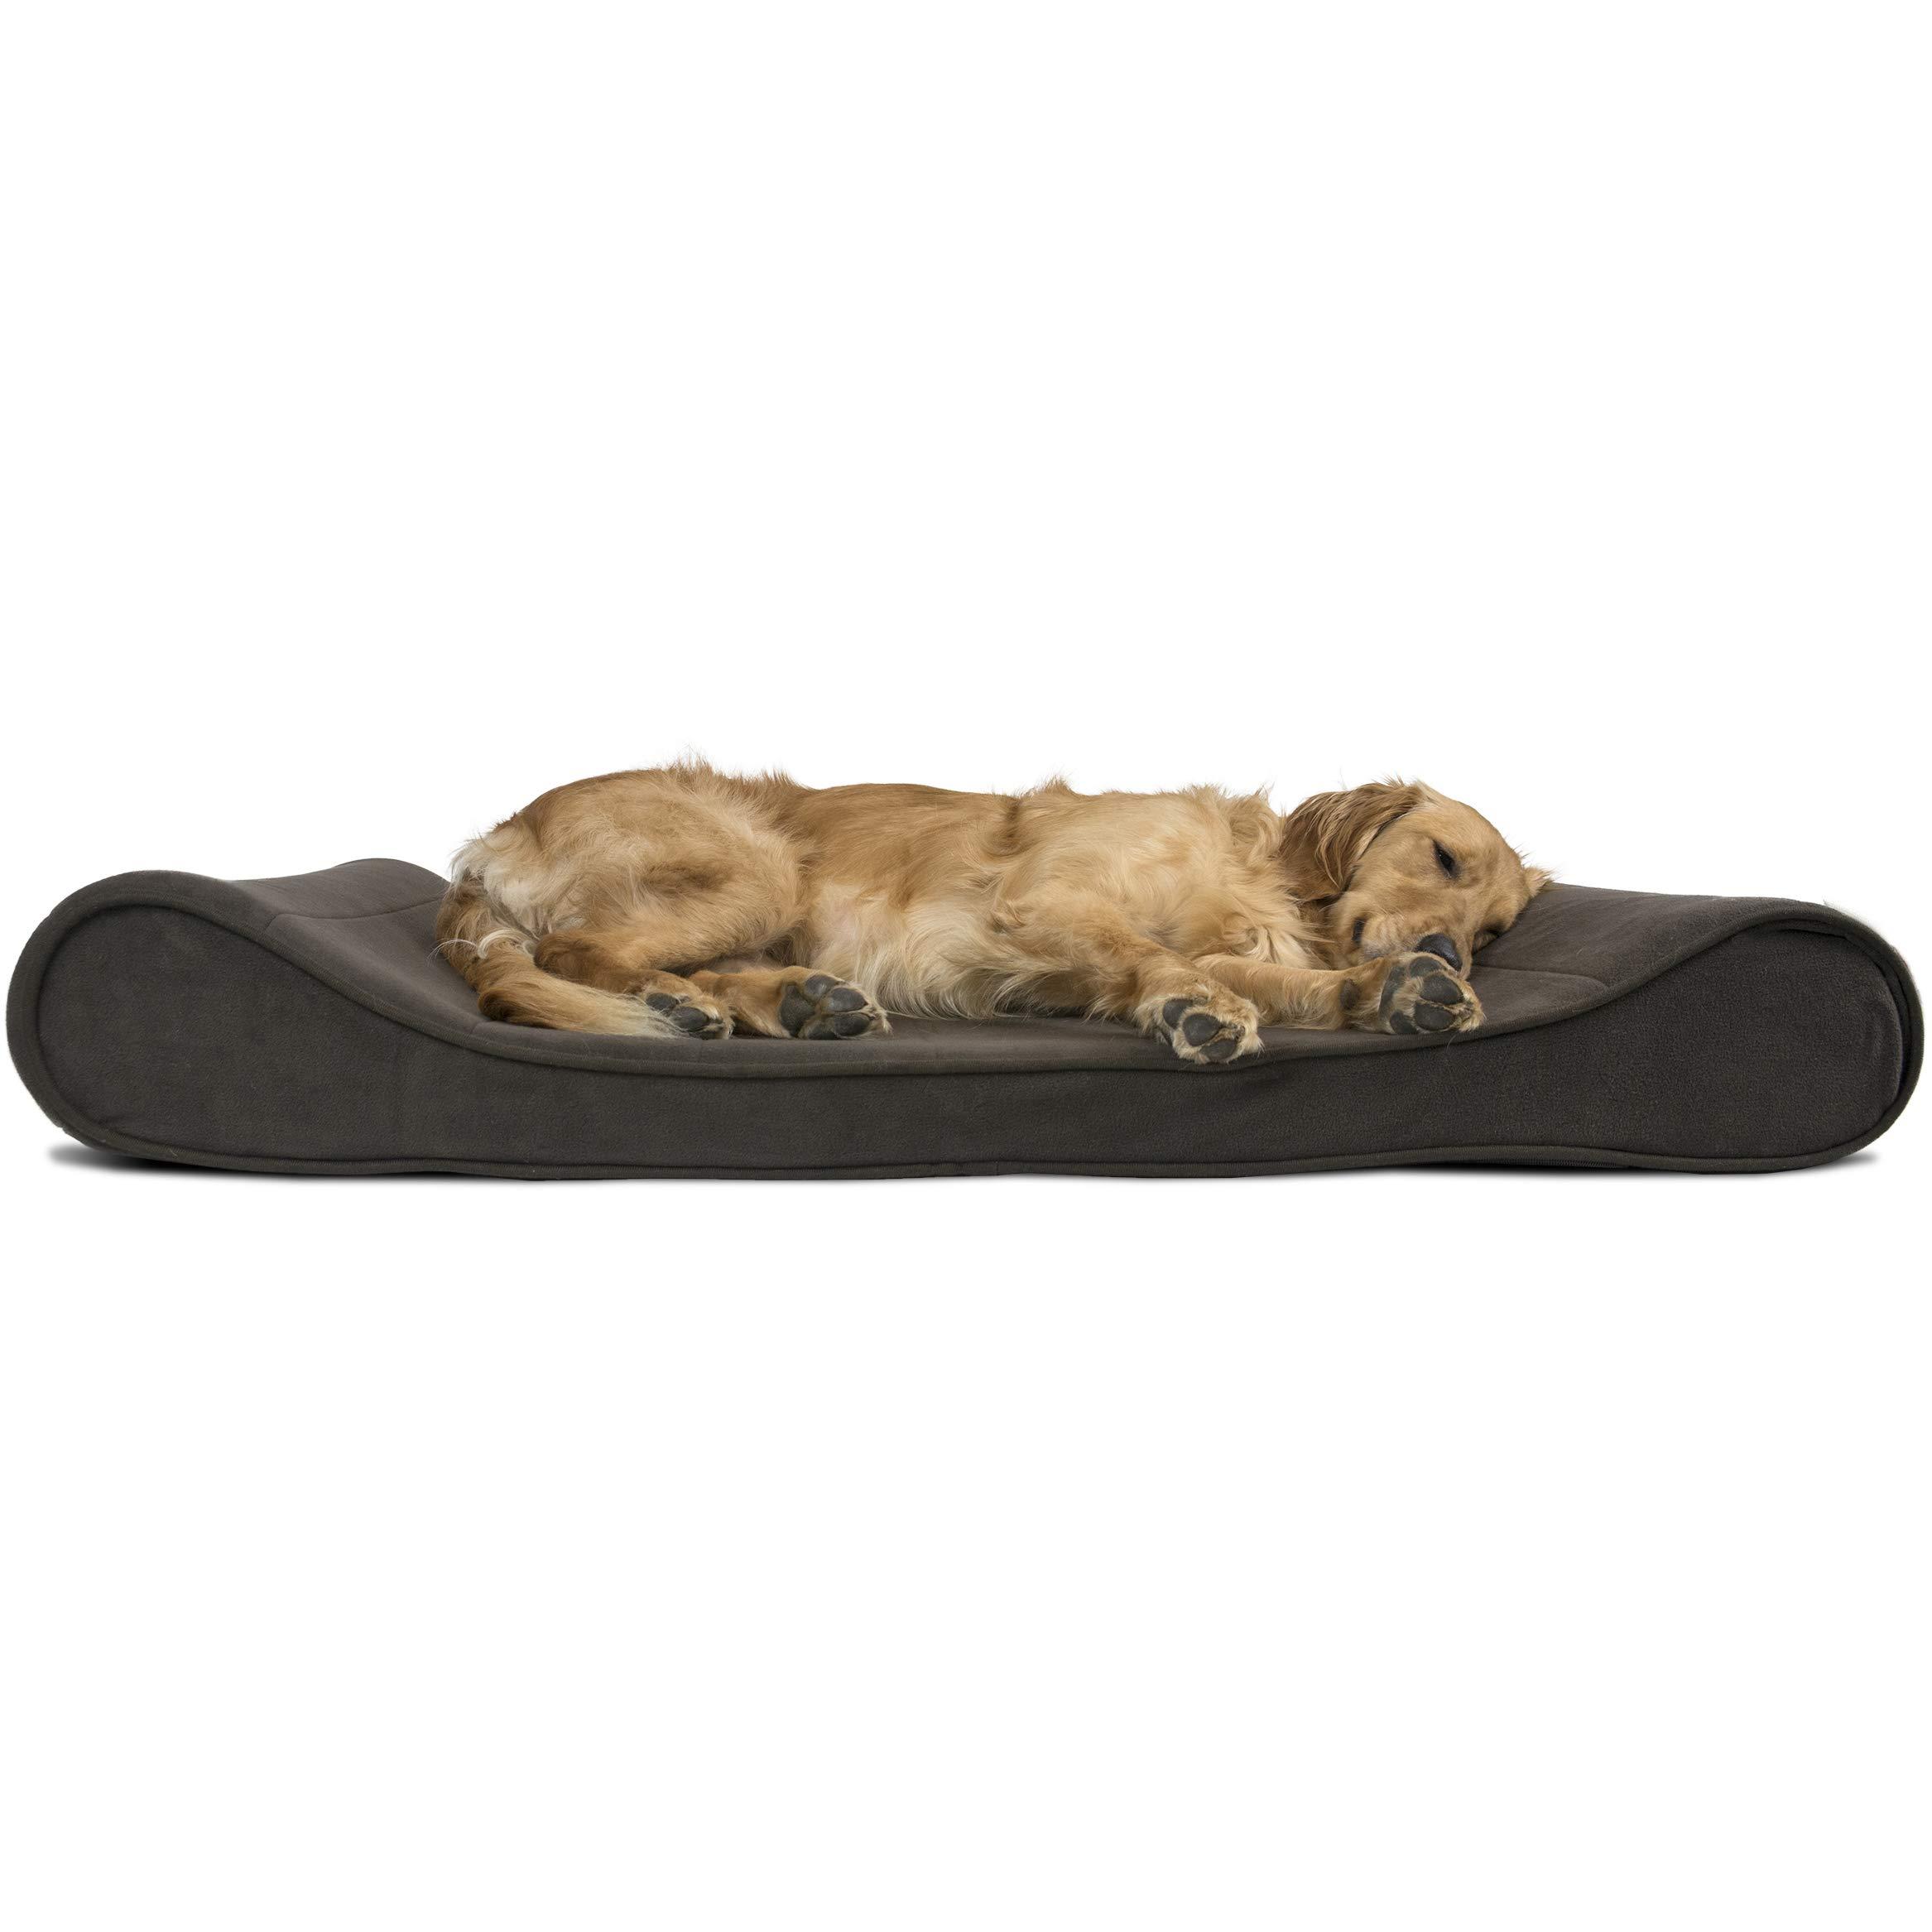 Furhaven Pet Dog Bed | Memory Foam Micro Velvet Ergonomic Luxe Lounger Cradle Mattress Contour Pet Bed for Dogs & Cats, Espresso, Jumbo